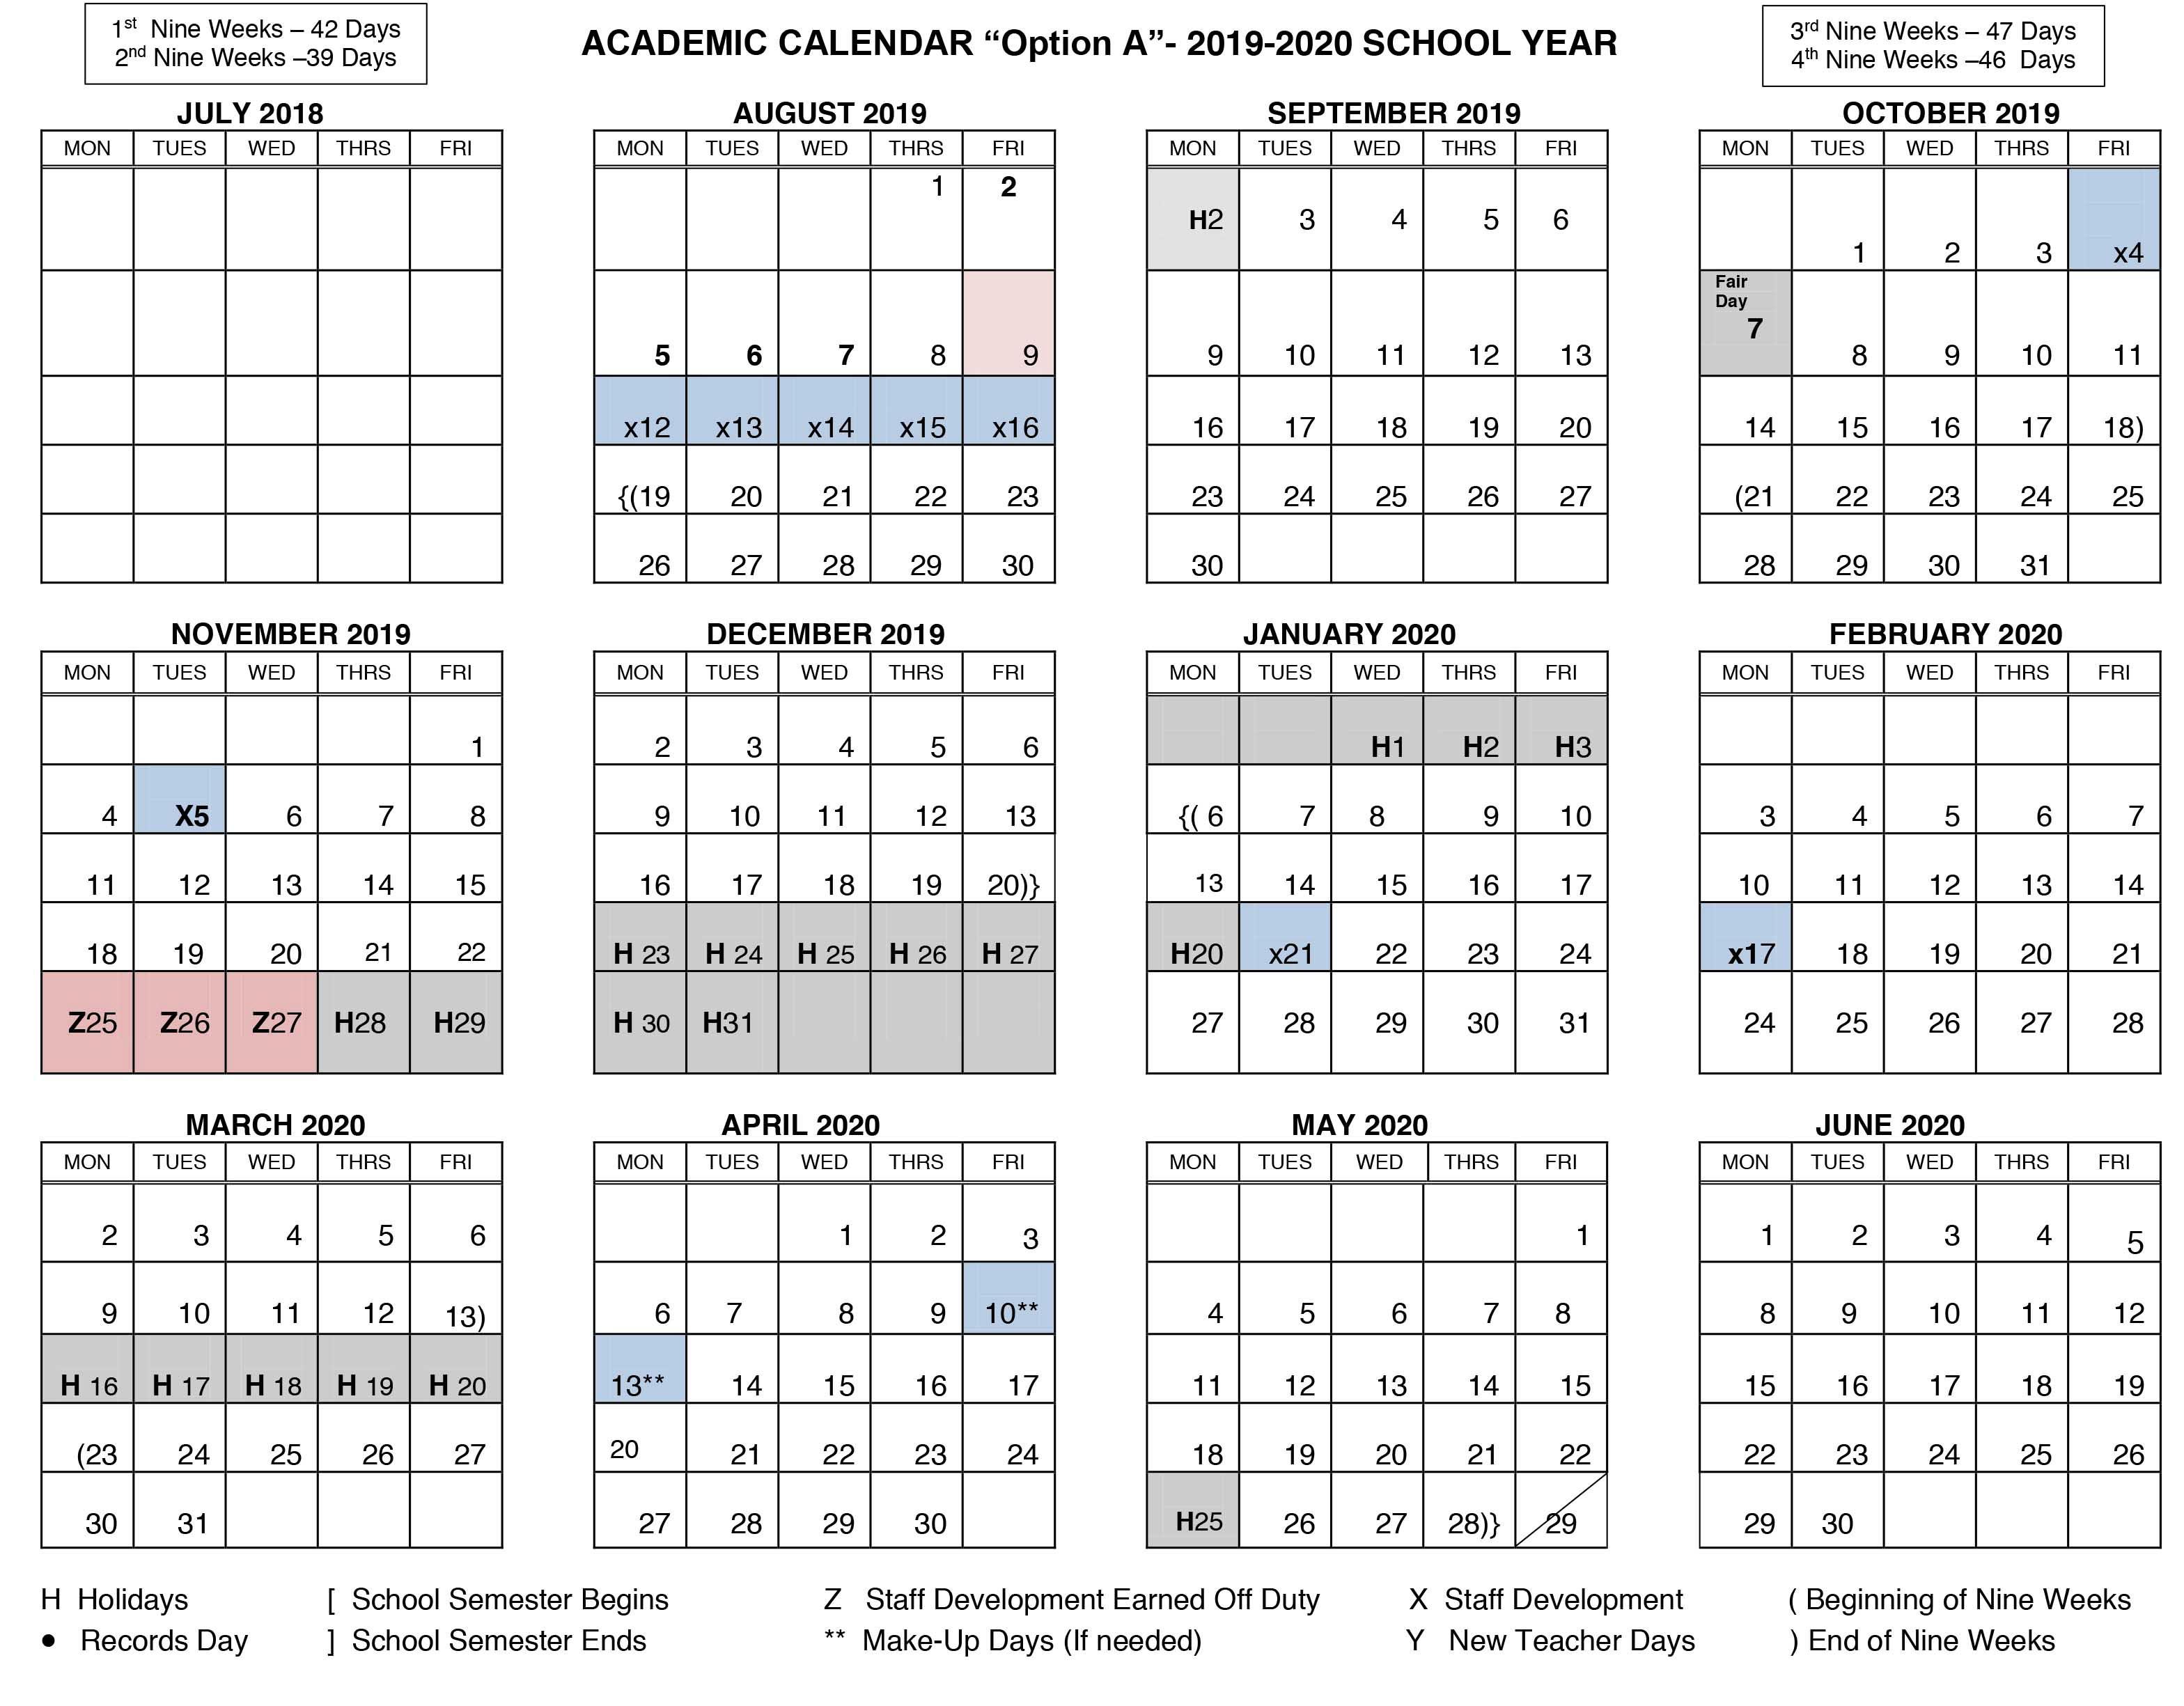 Calendar 2020 Canada Pdf - 2019 Calendar pertaining to Canadian Printable Academic Calendar 2019-2020